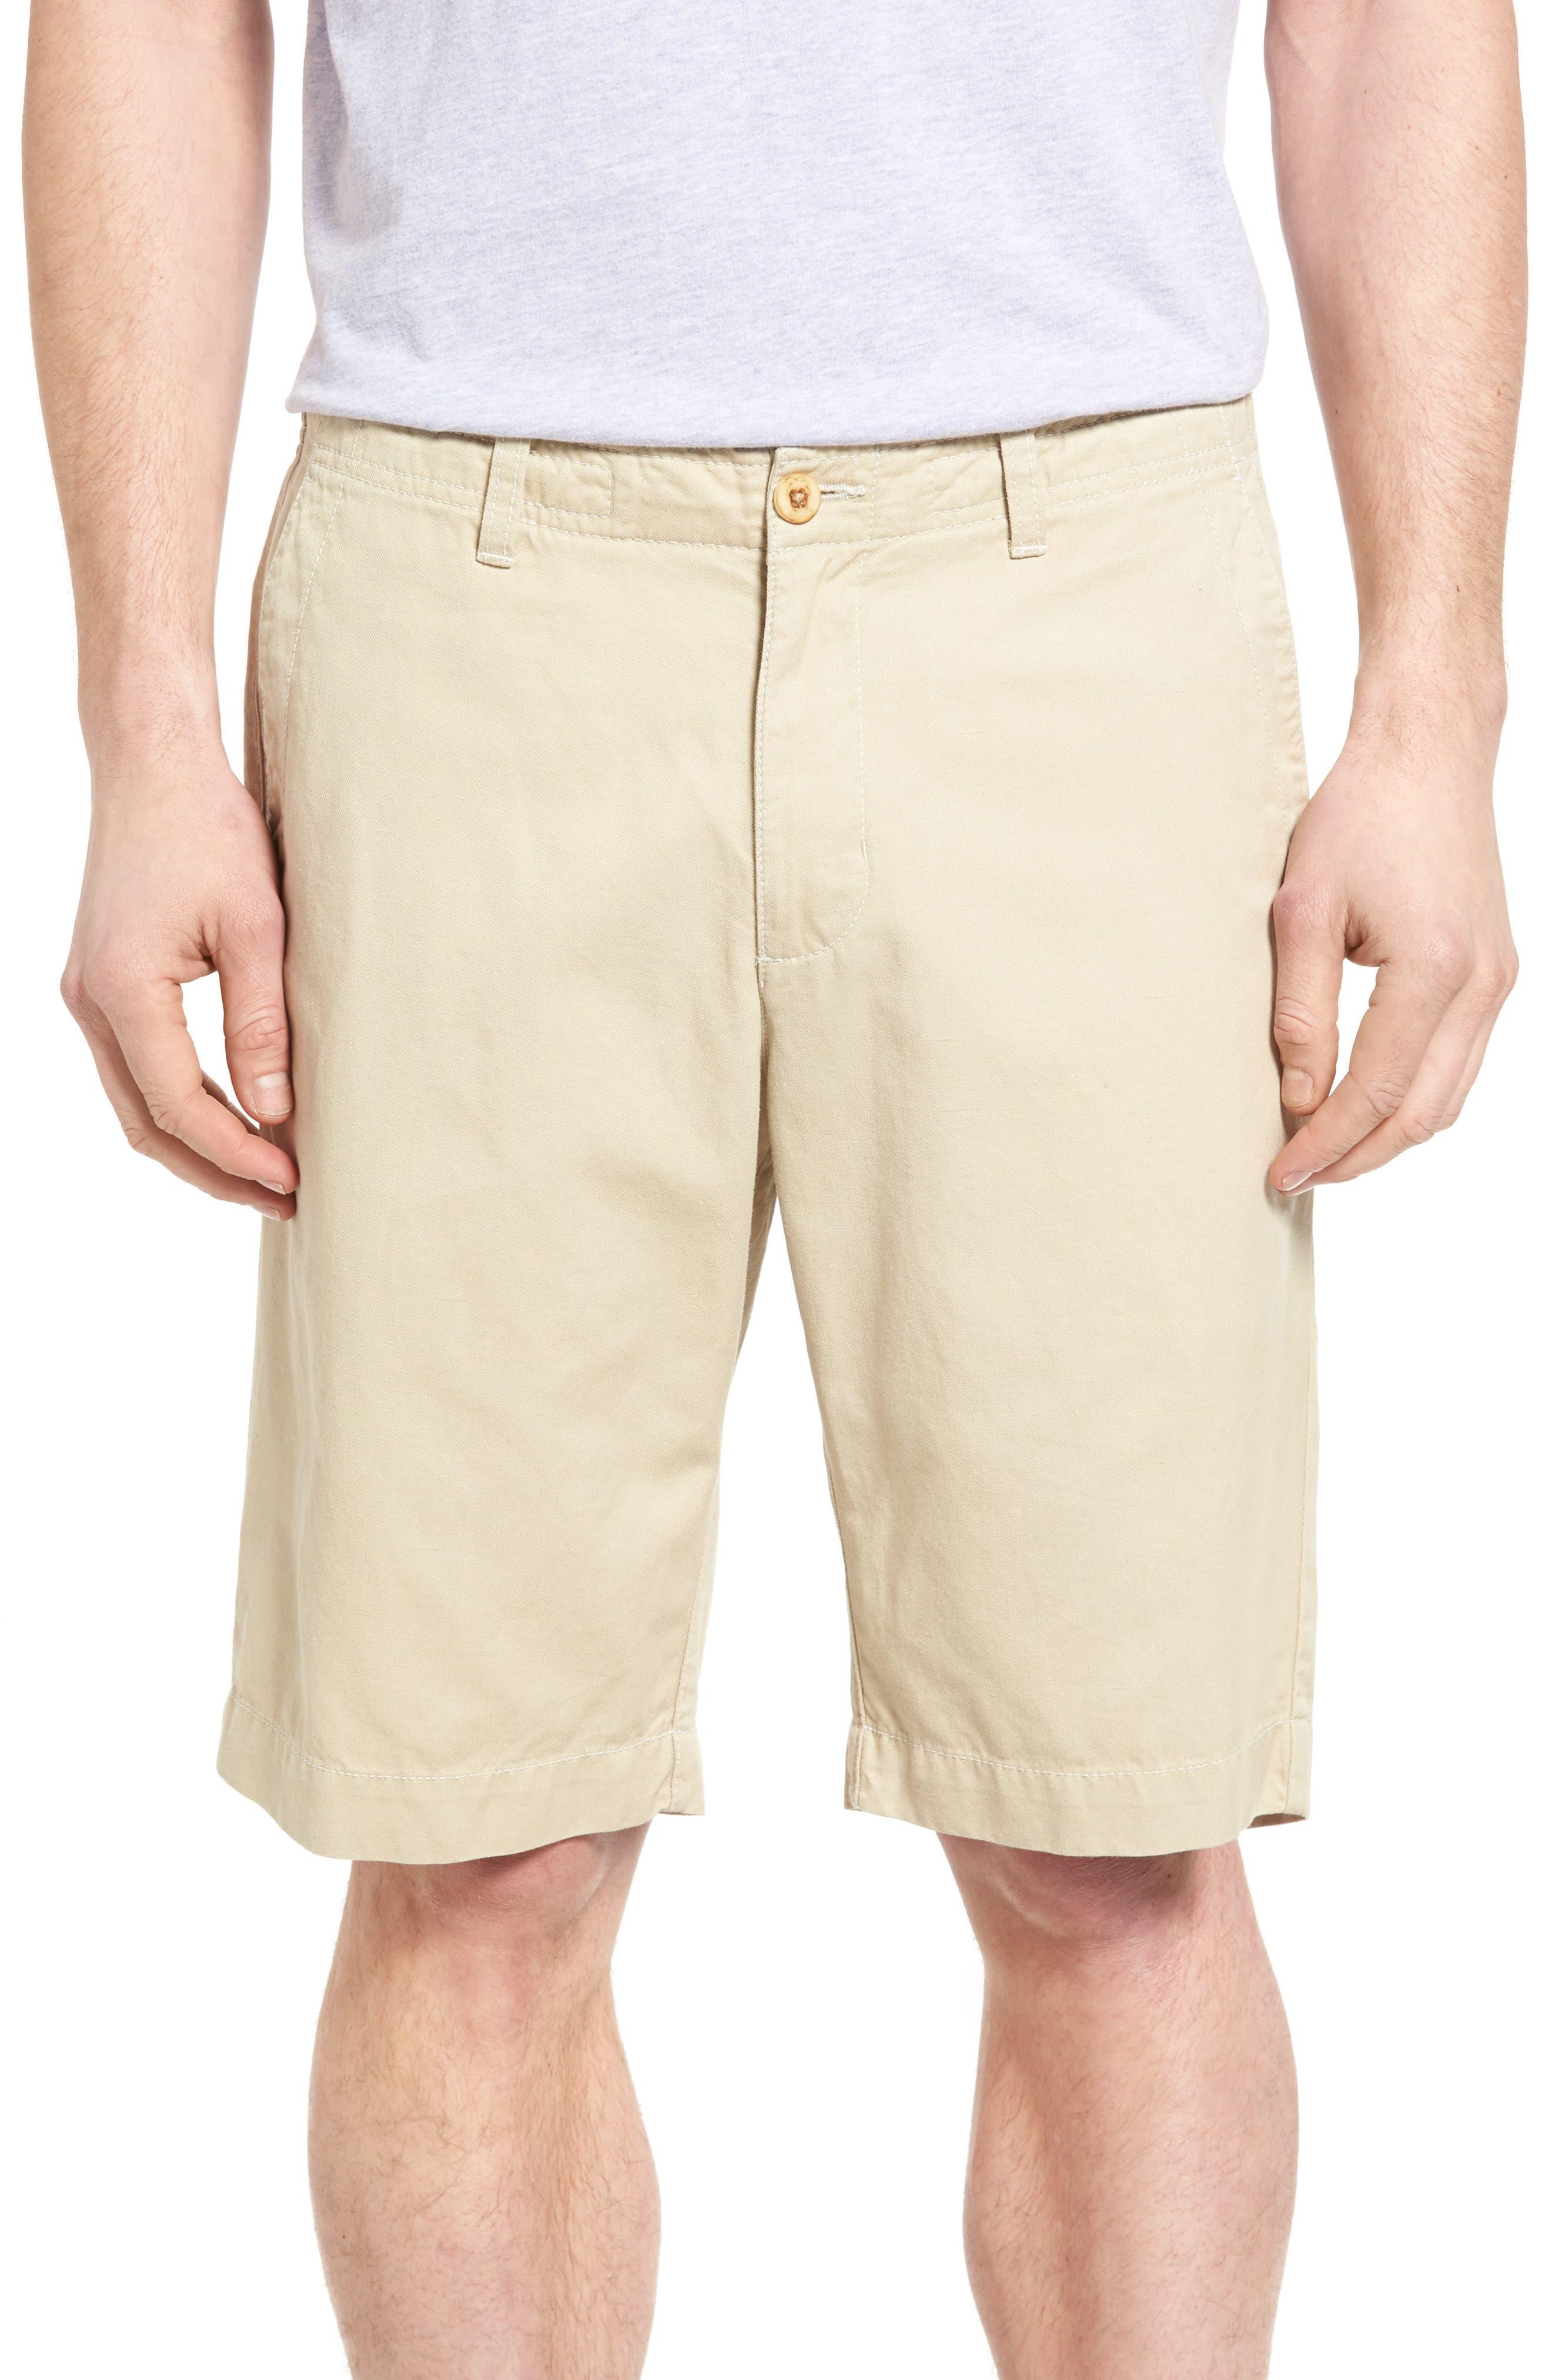 Aegean Lounger Shorts,                             Main thumbnail 1, color,                             200